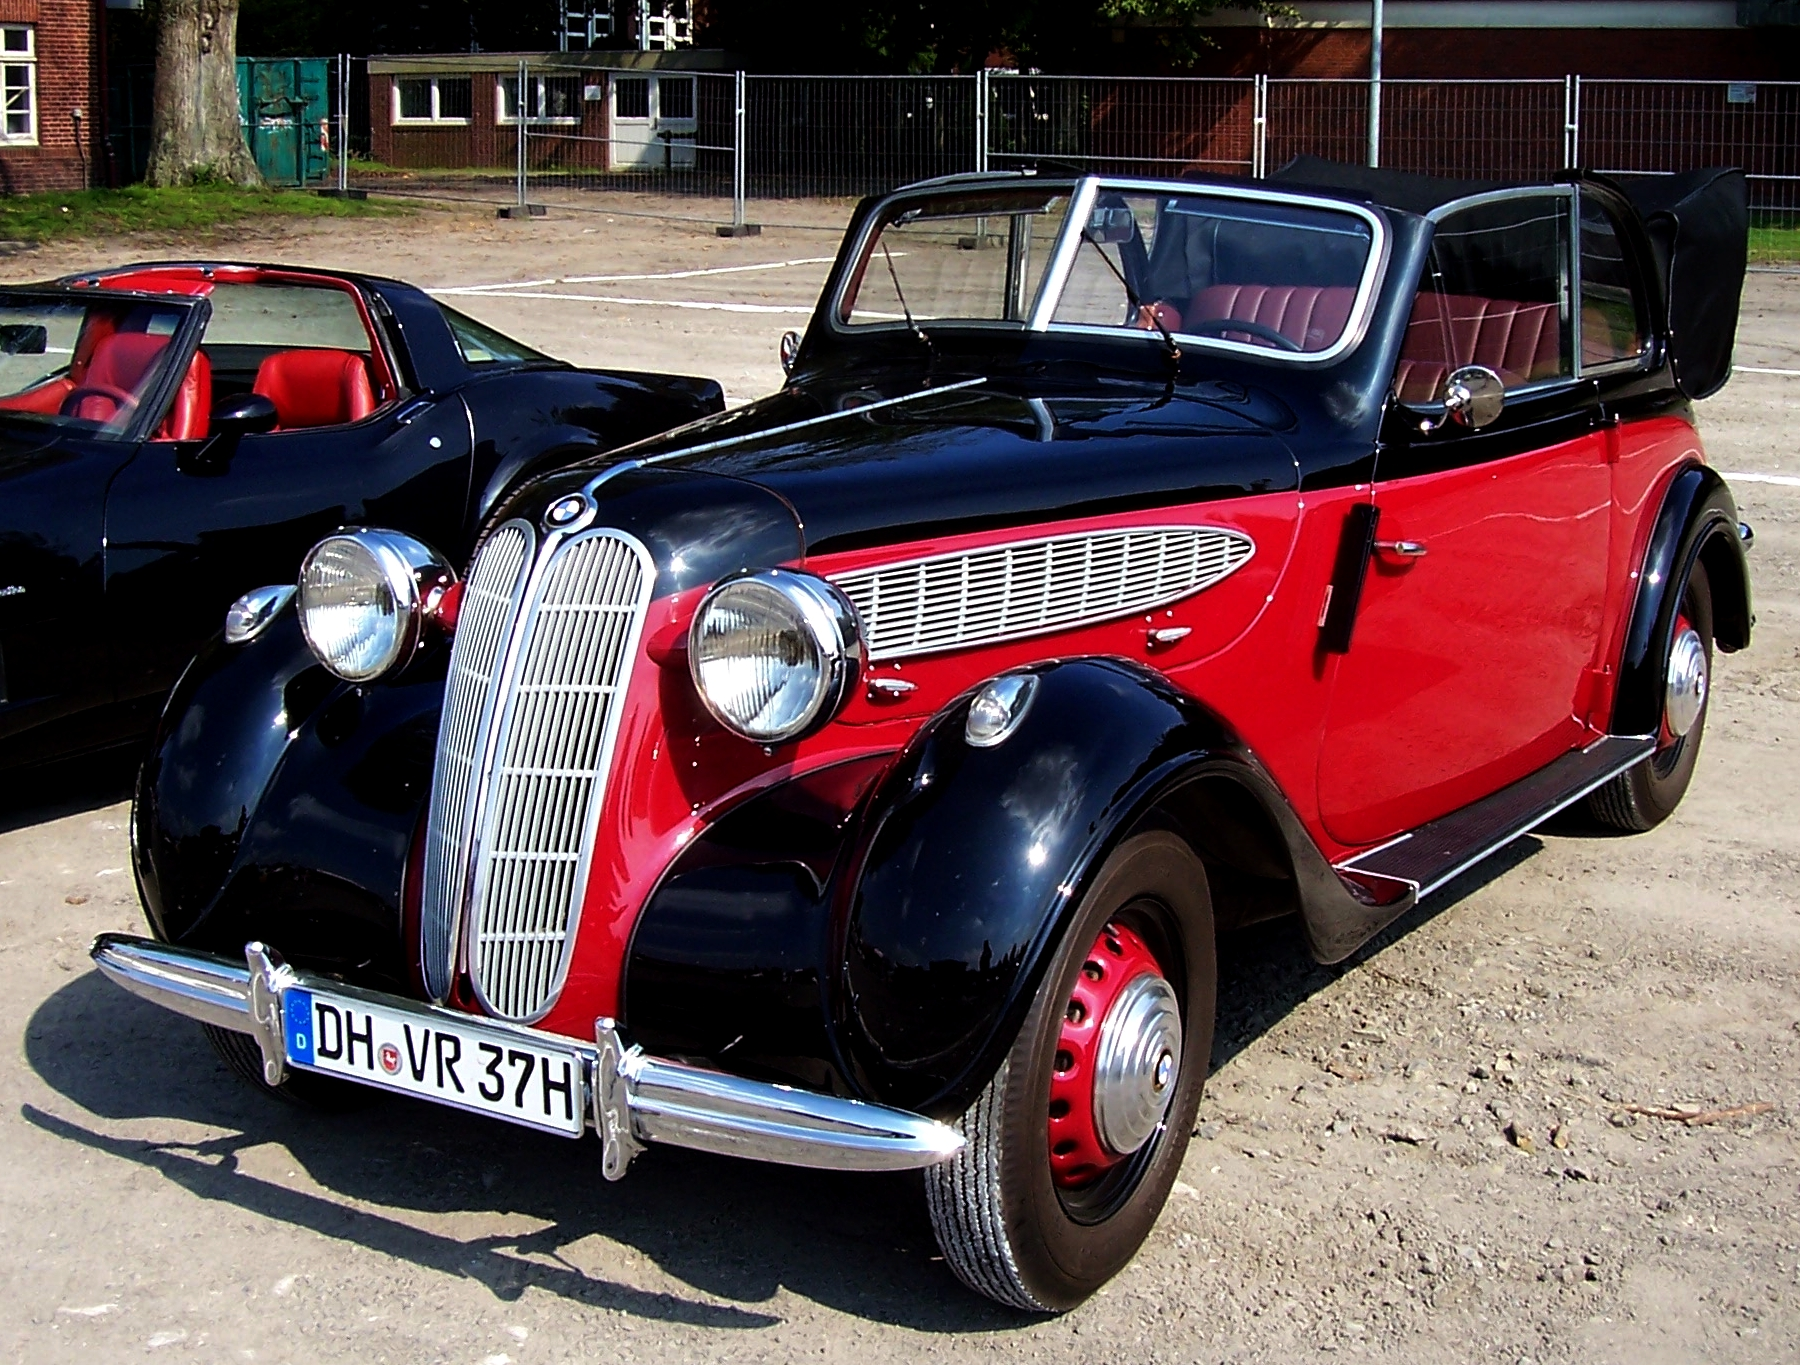 file 1937 bmw 329 cabriolet cloppenburg 445 cropped jpg wikimedia commons. Black Bedroom Furniture Sets. Home Design Ideas